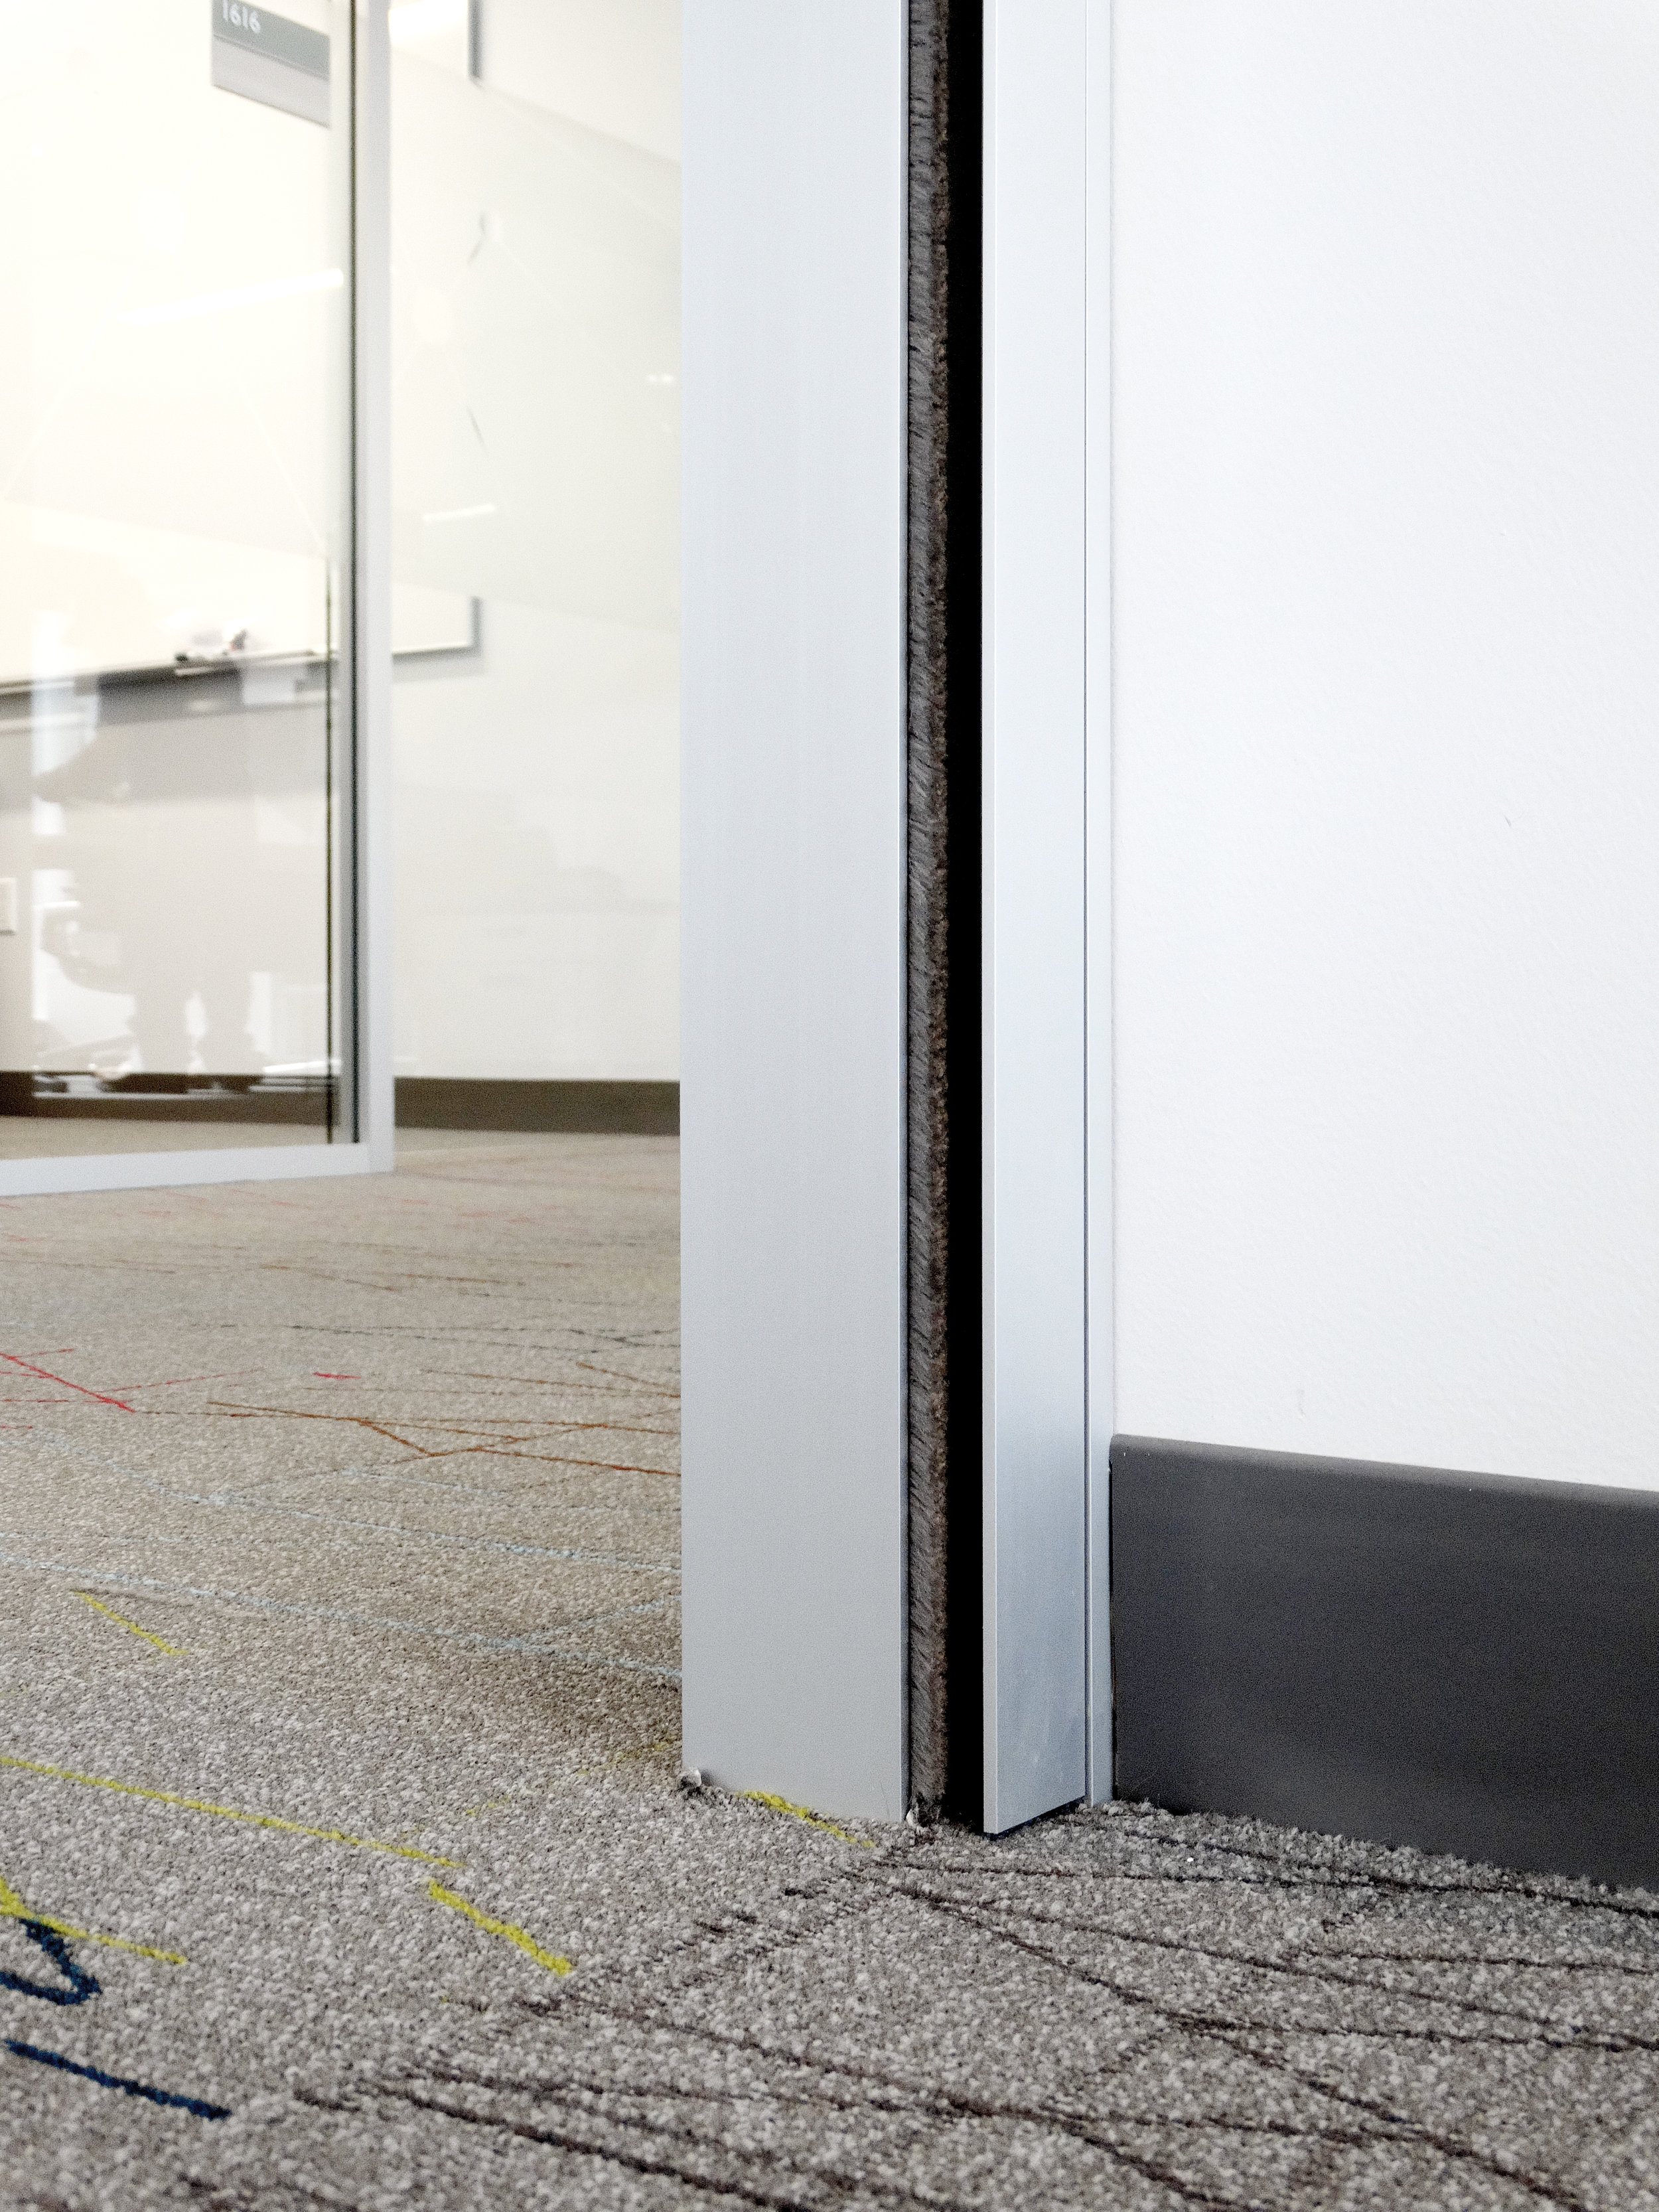 Litespace Sliding Glass Door Receiving Channel - Spaceworks AI.jpg